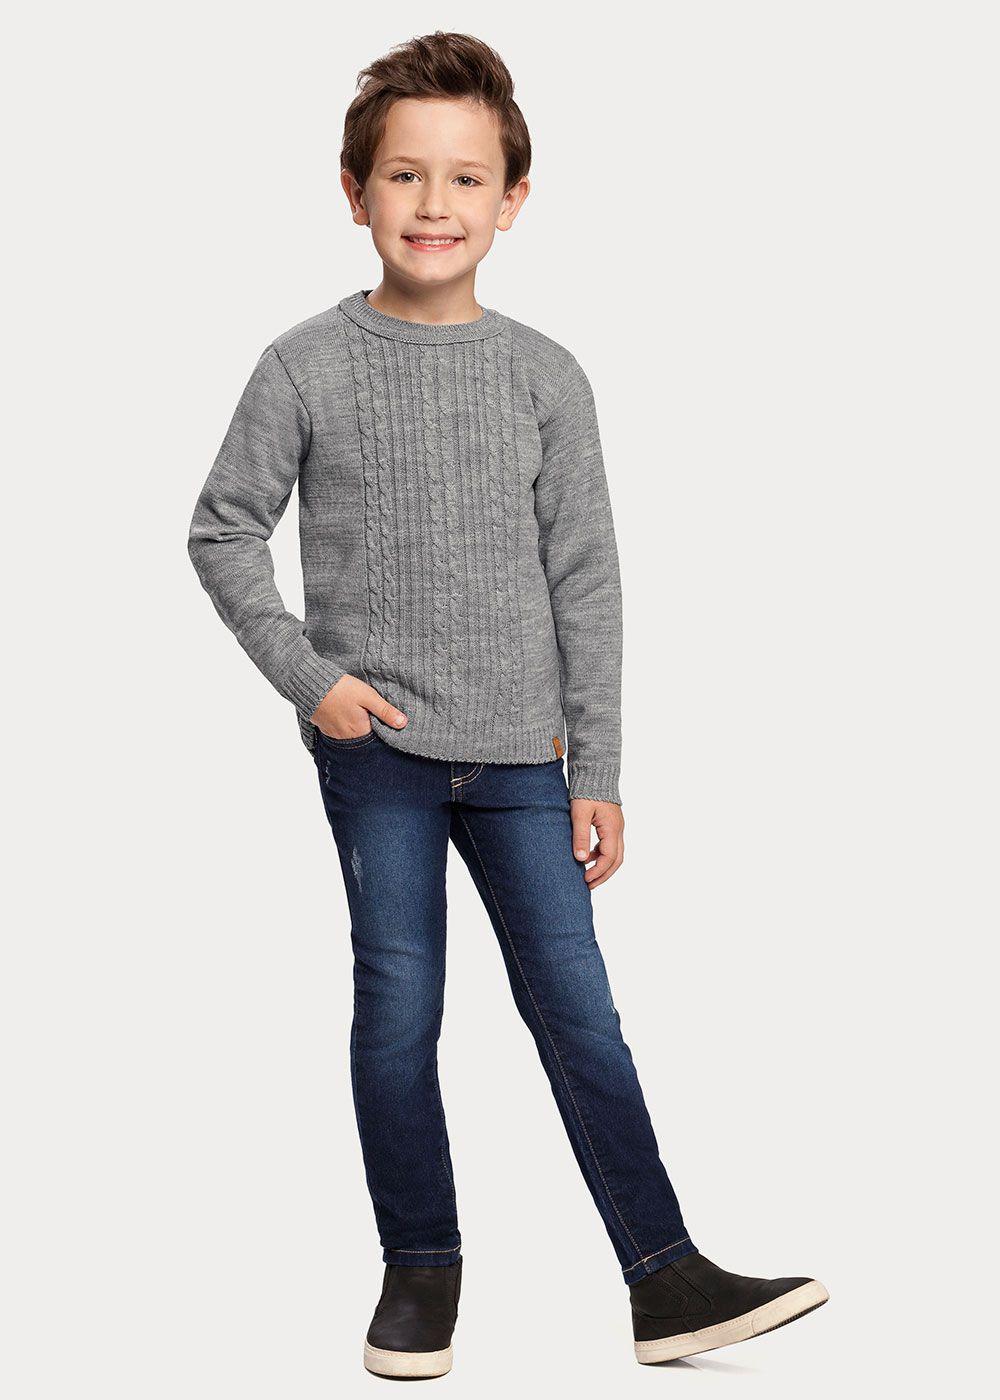 Cardigan Infantil Masculino Inverno Cinza Tricô Alakazoo